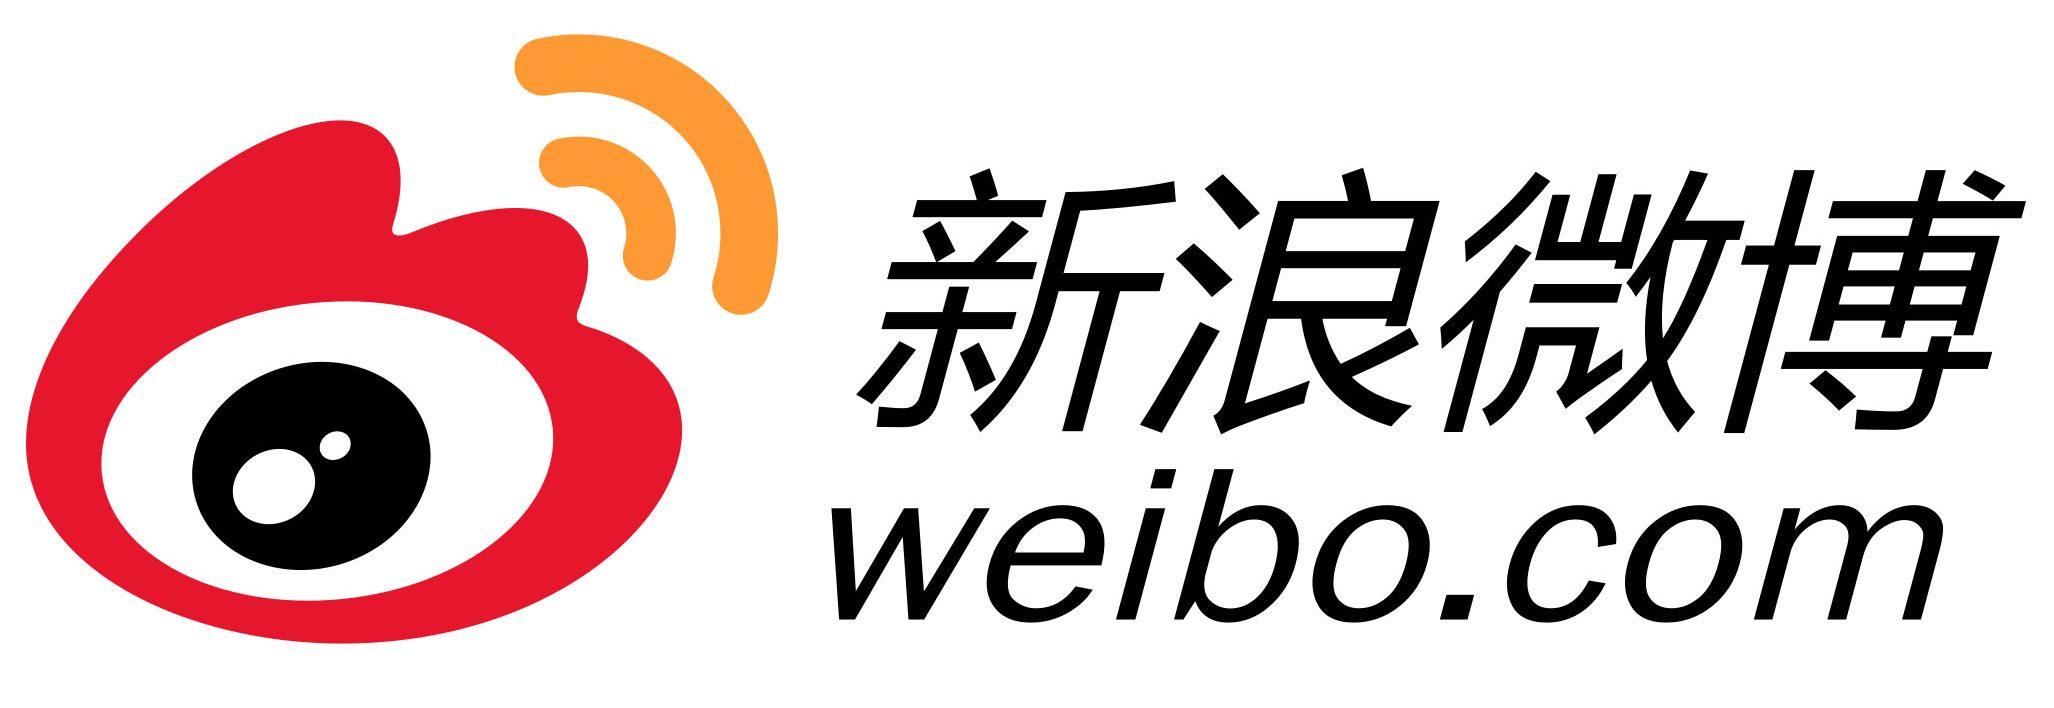 Sina-Weibo-logo-copy